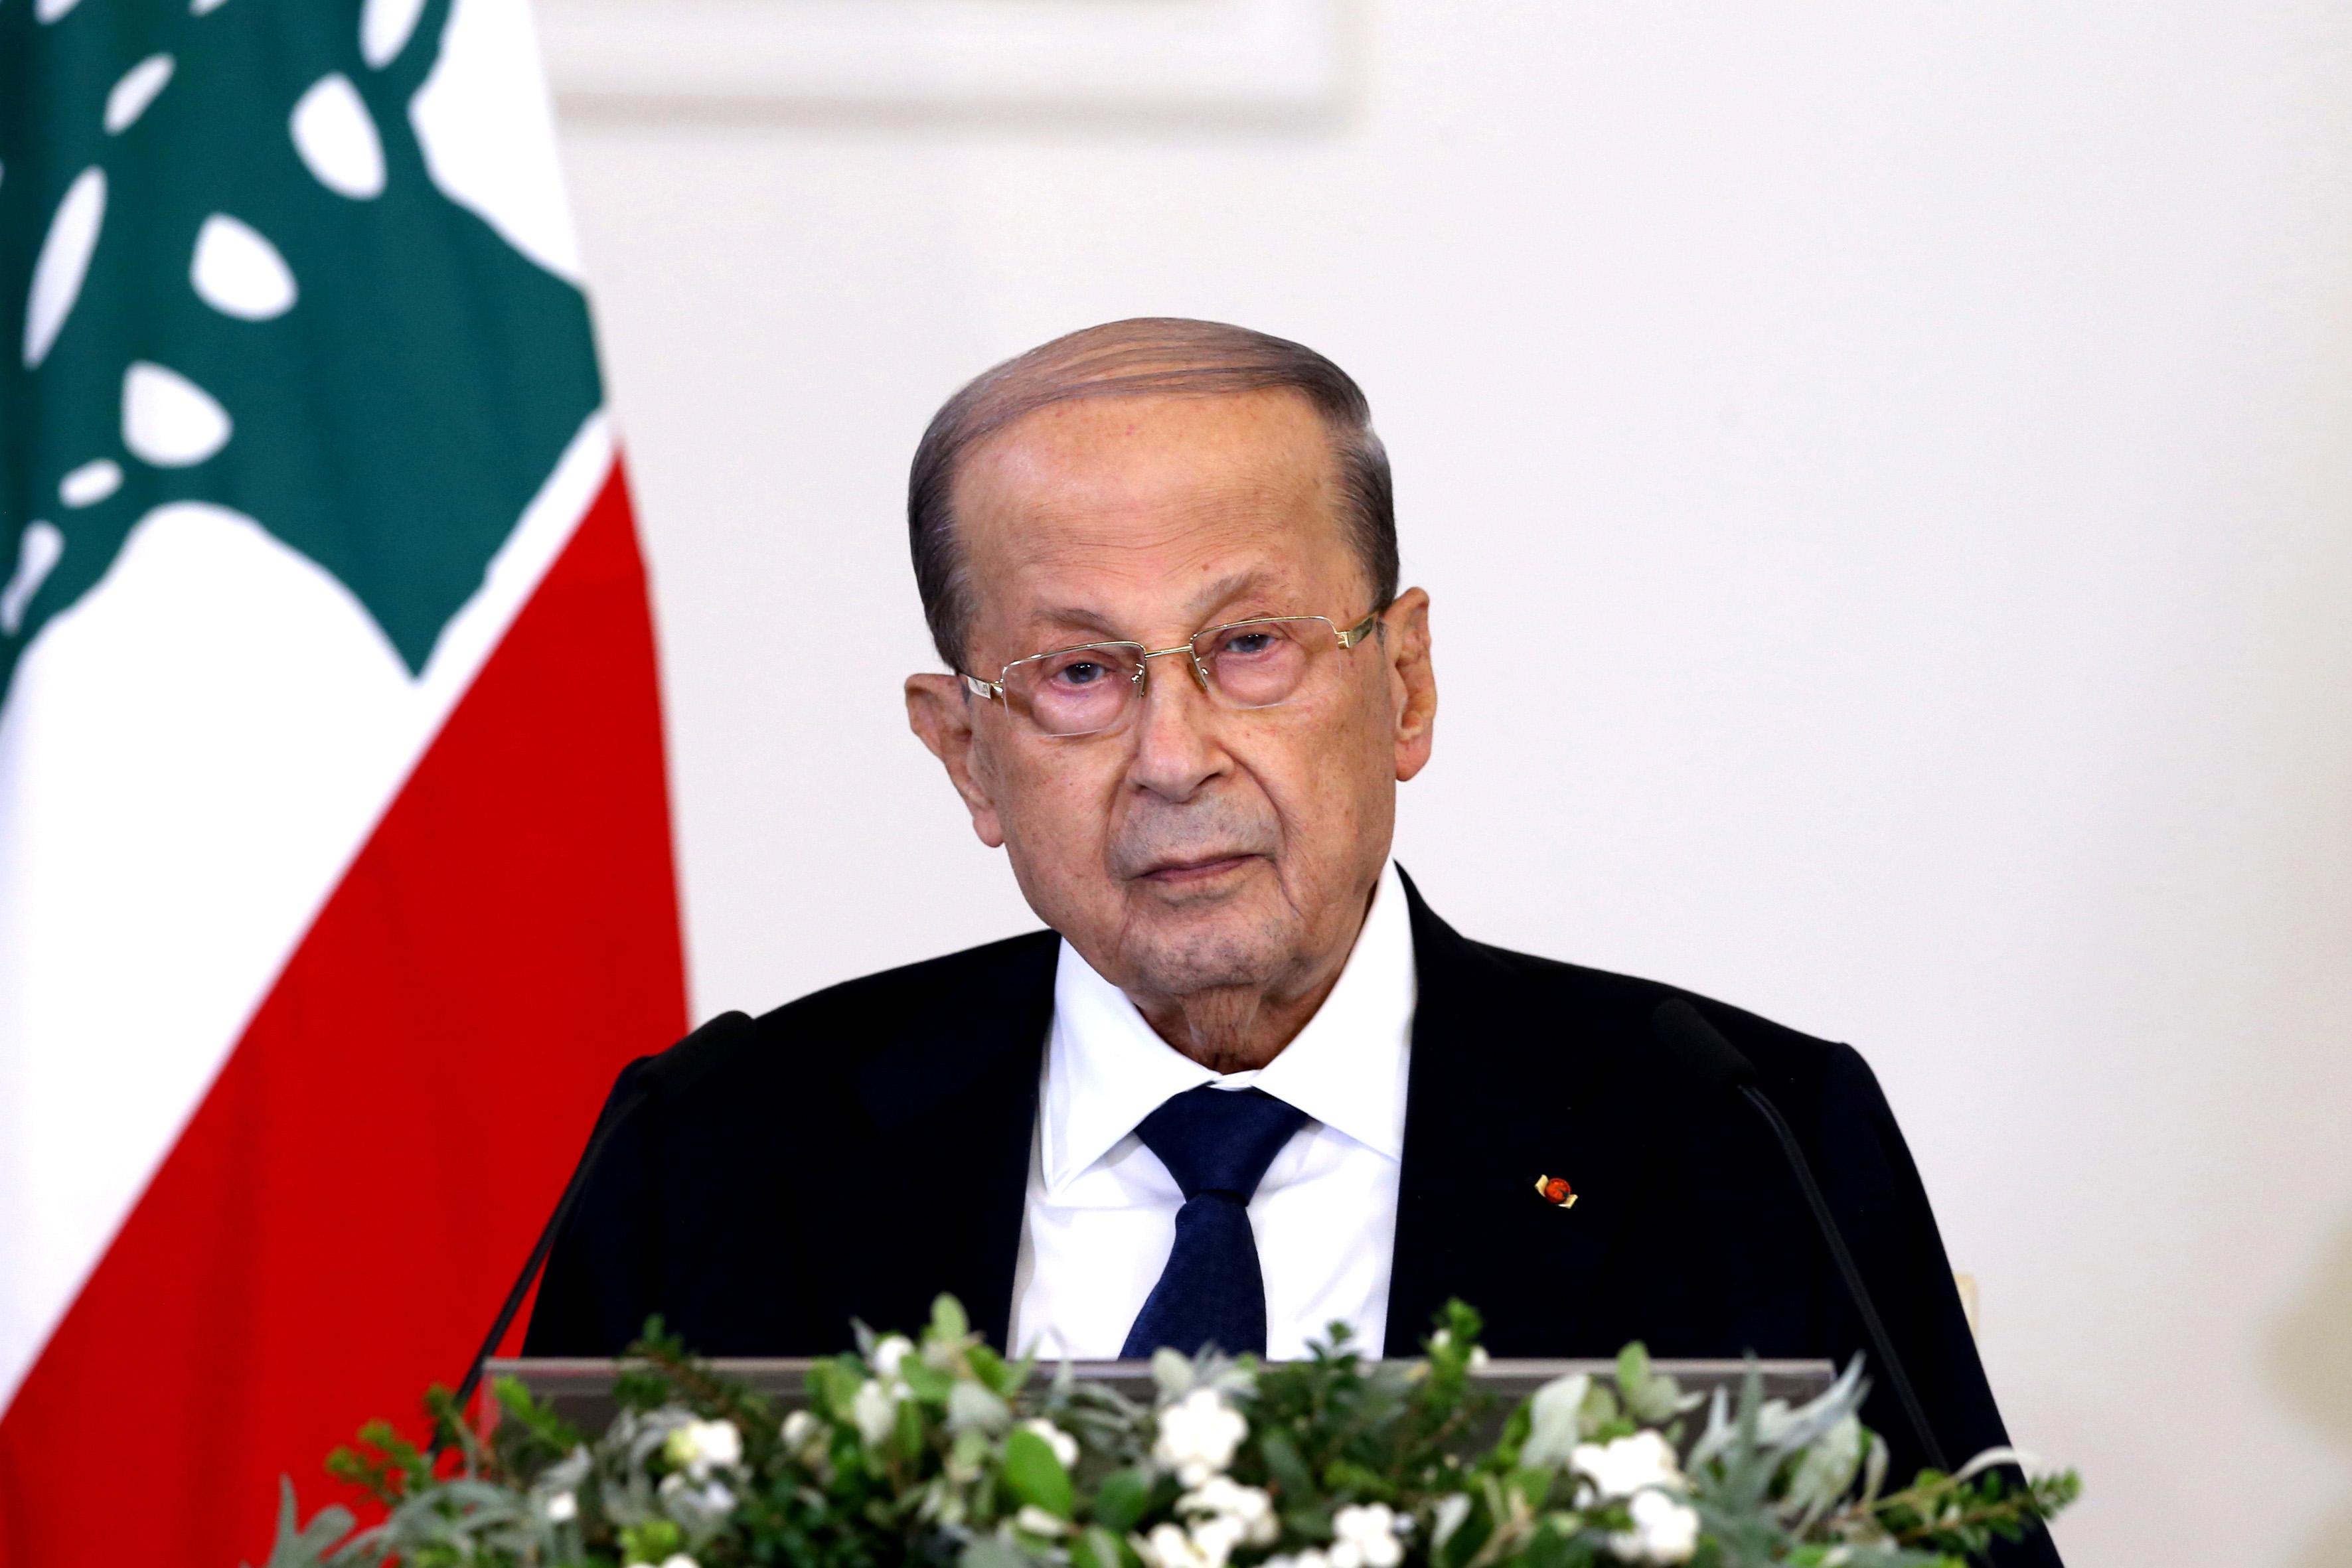 01 - President Michel Aoun press conference 20 oct 2020 (7)